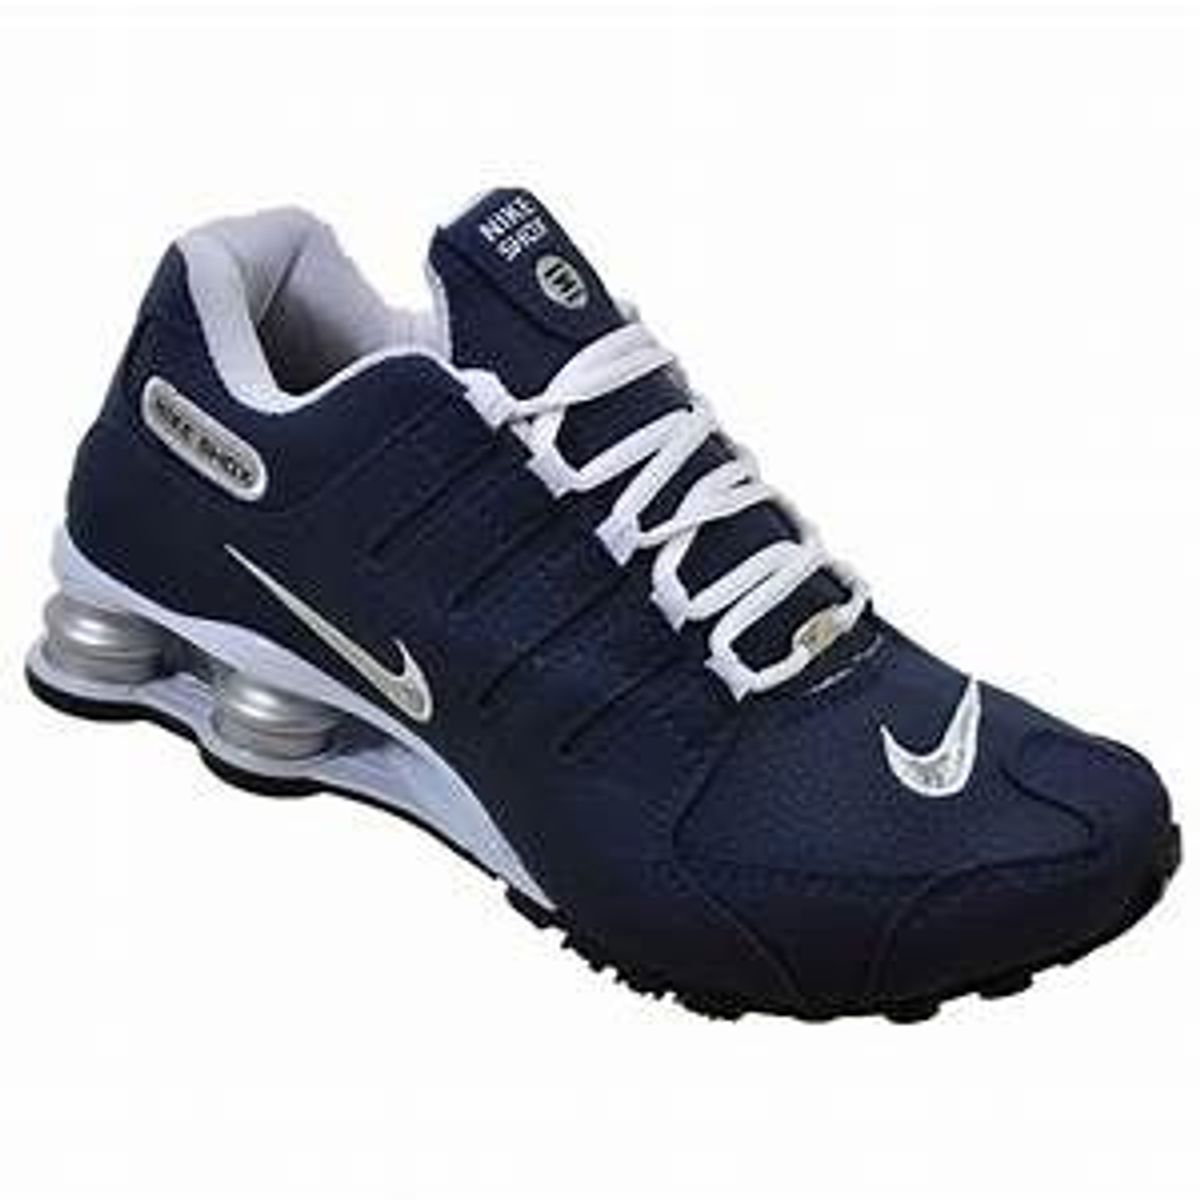 df221bbd482 Tenis Novo Nike Shox Nz Azul Numero 40